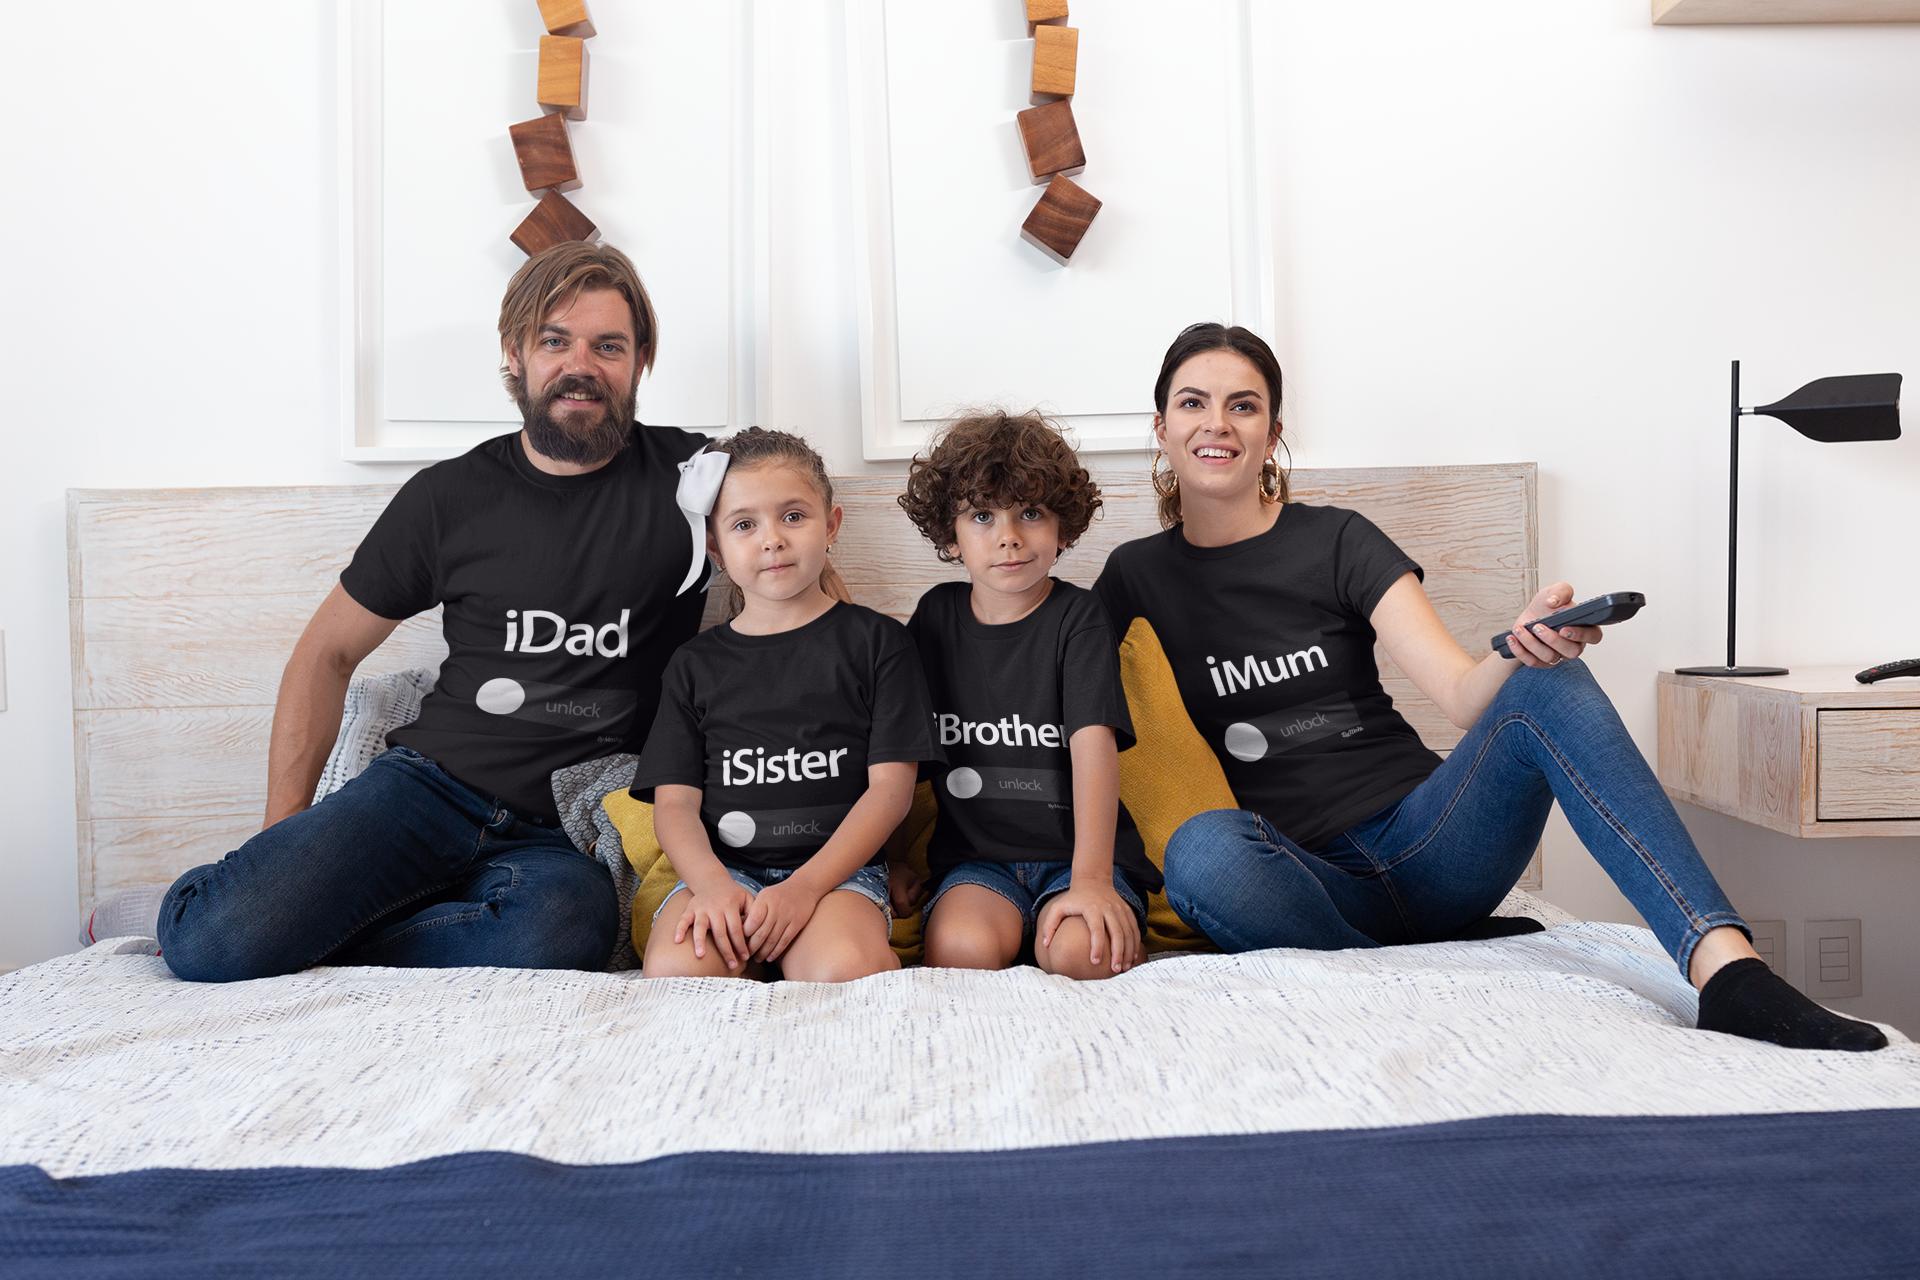 Camiseta para vestir igual madre e hijo